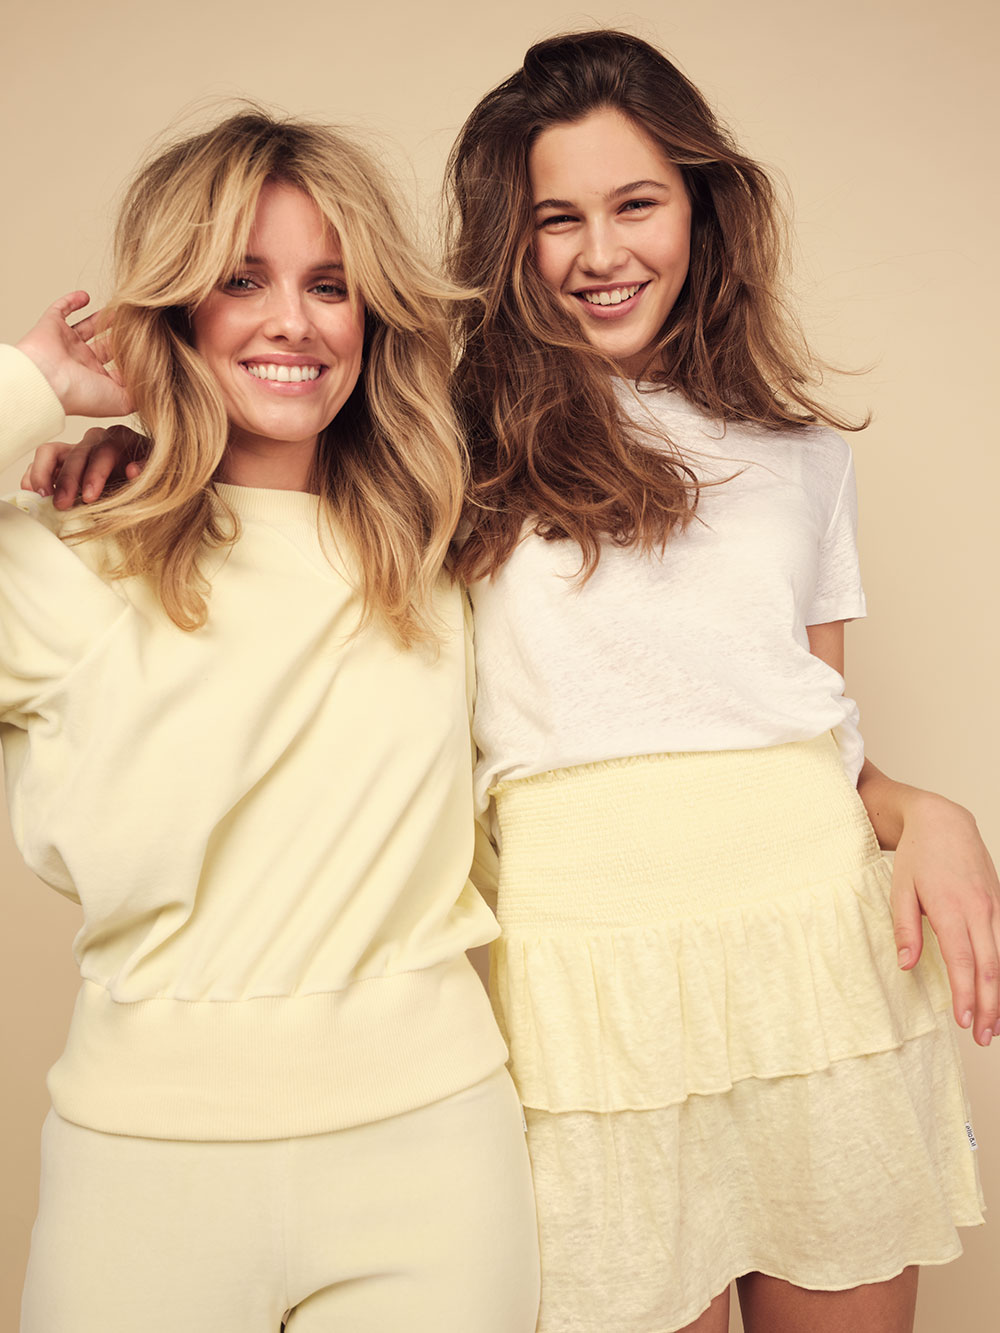 Norske ella&il satser internasjonalt med loungewear under korona